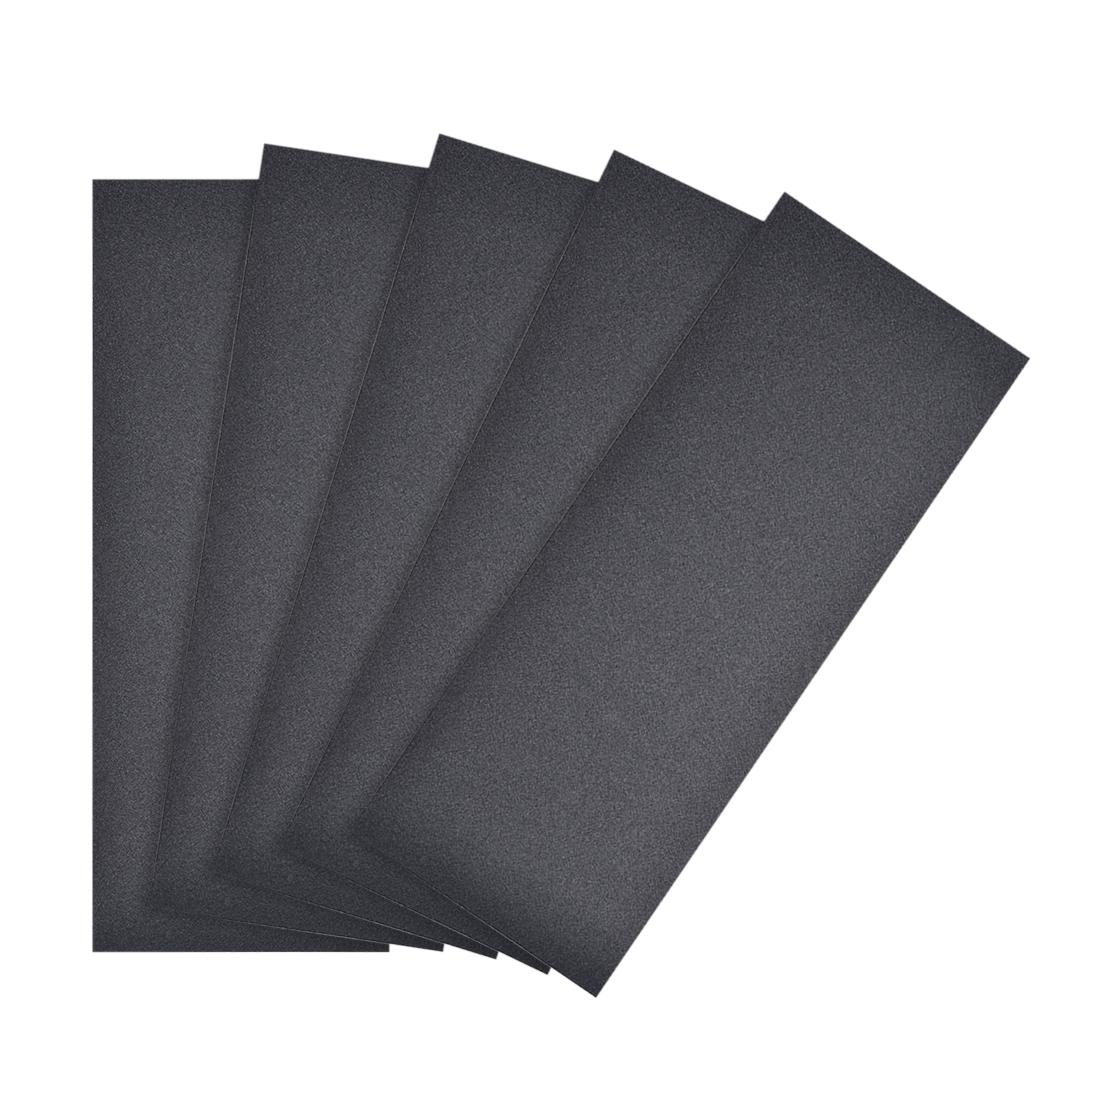 Waterproof Sandpaper, Wet Dry Sand Paper Grit of 280, 9 x 3.7inch 5pcs